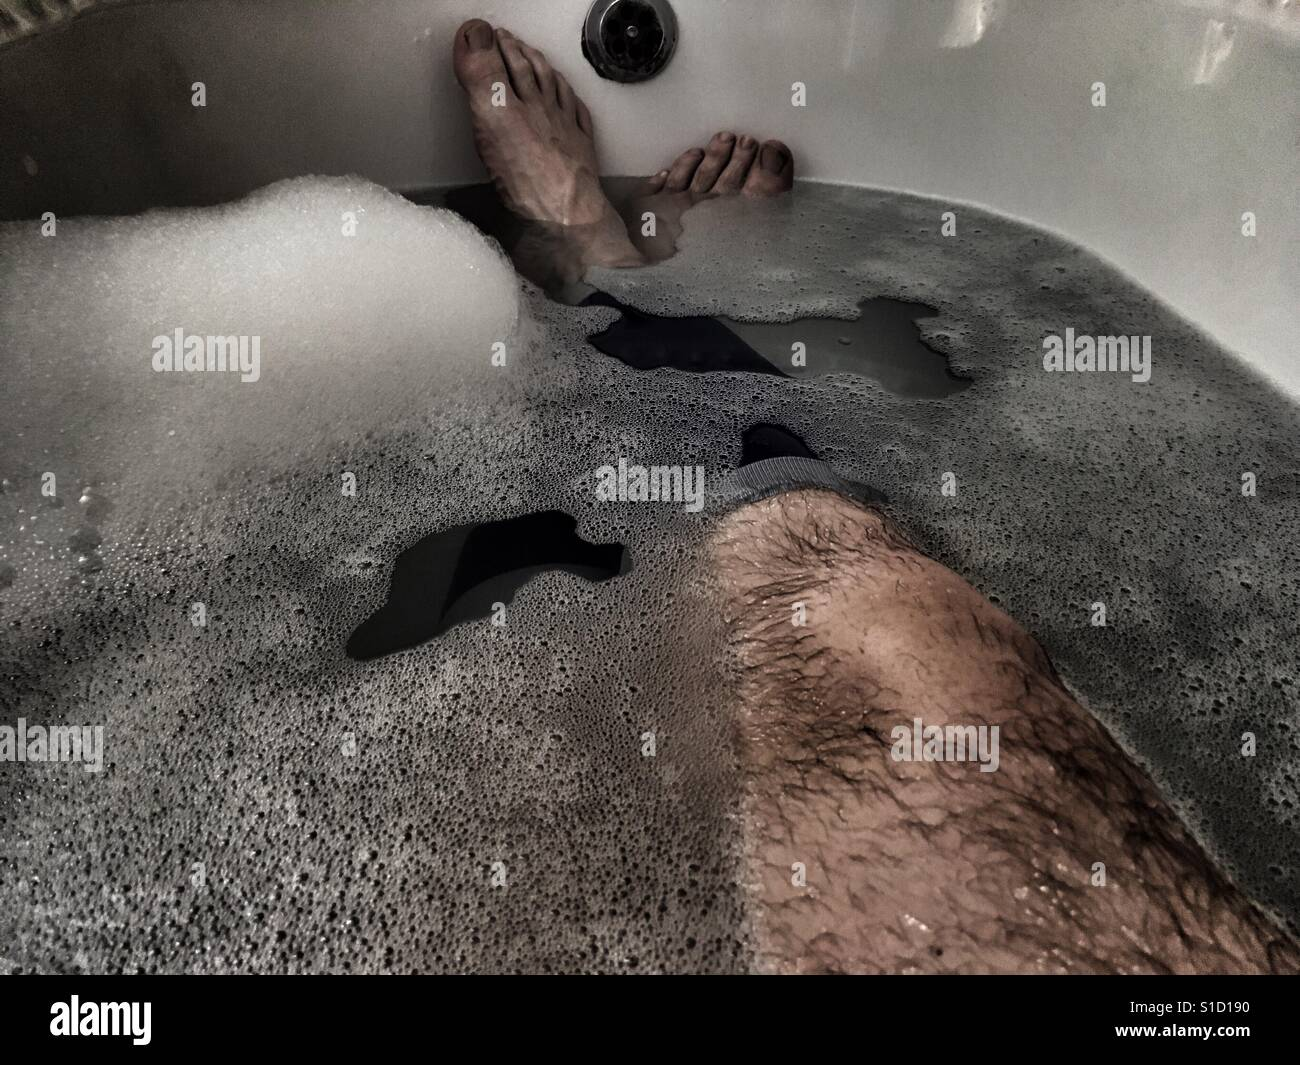 Marathon Runner's recovery bath - Stock Image